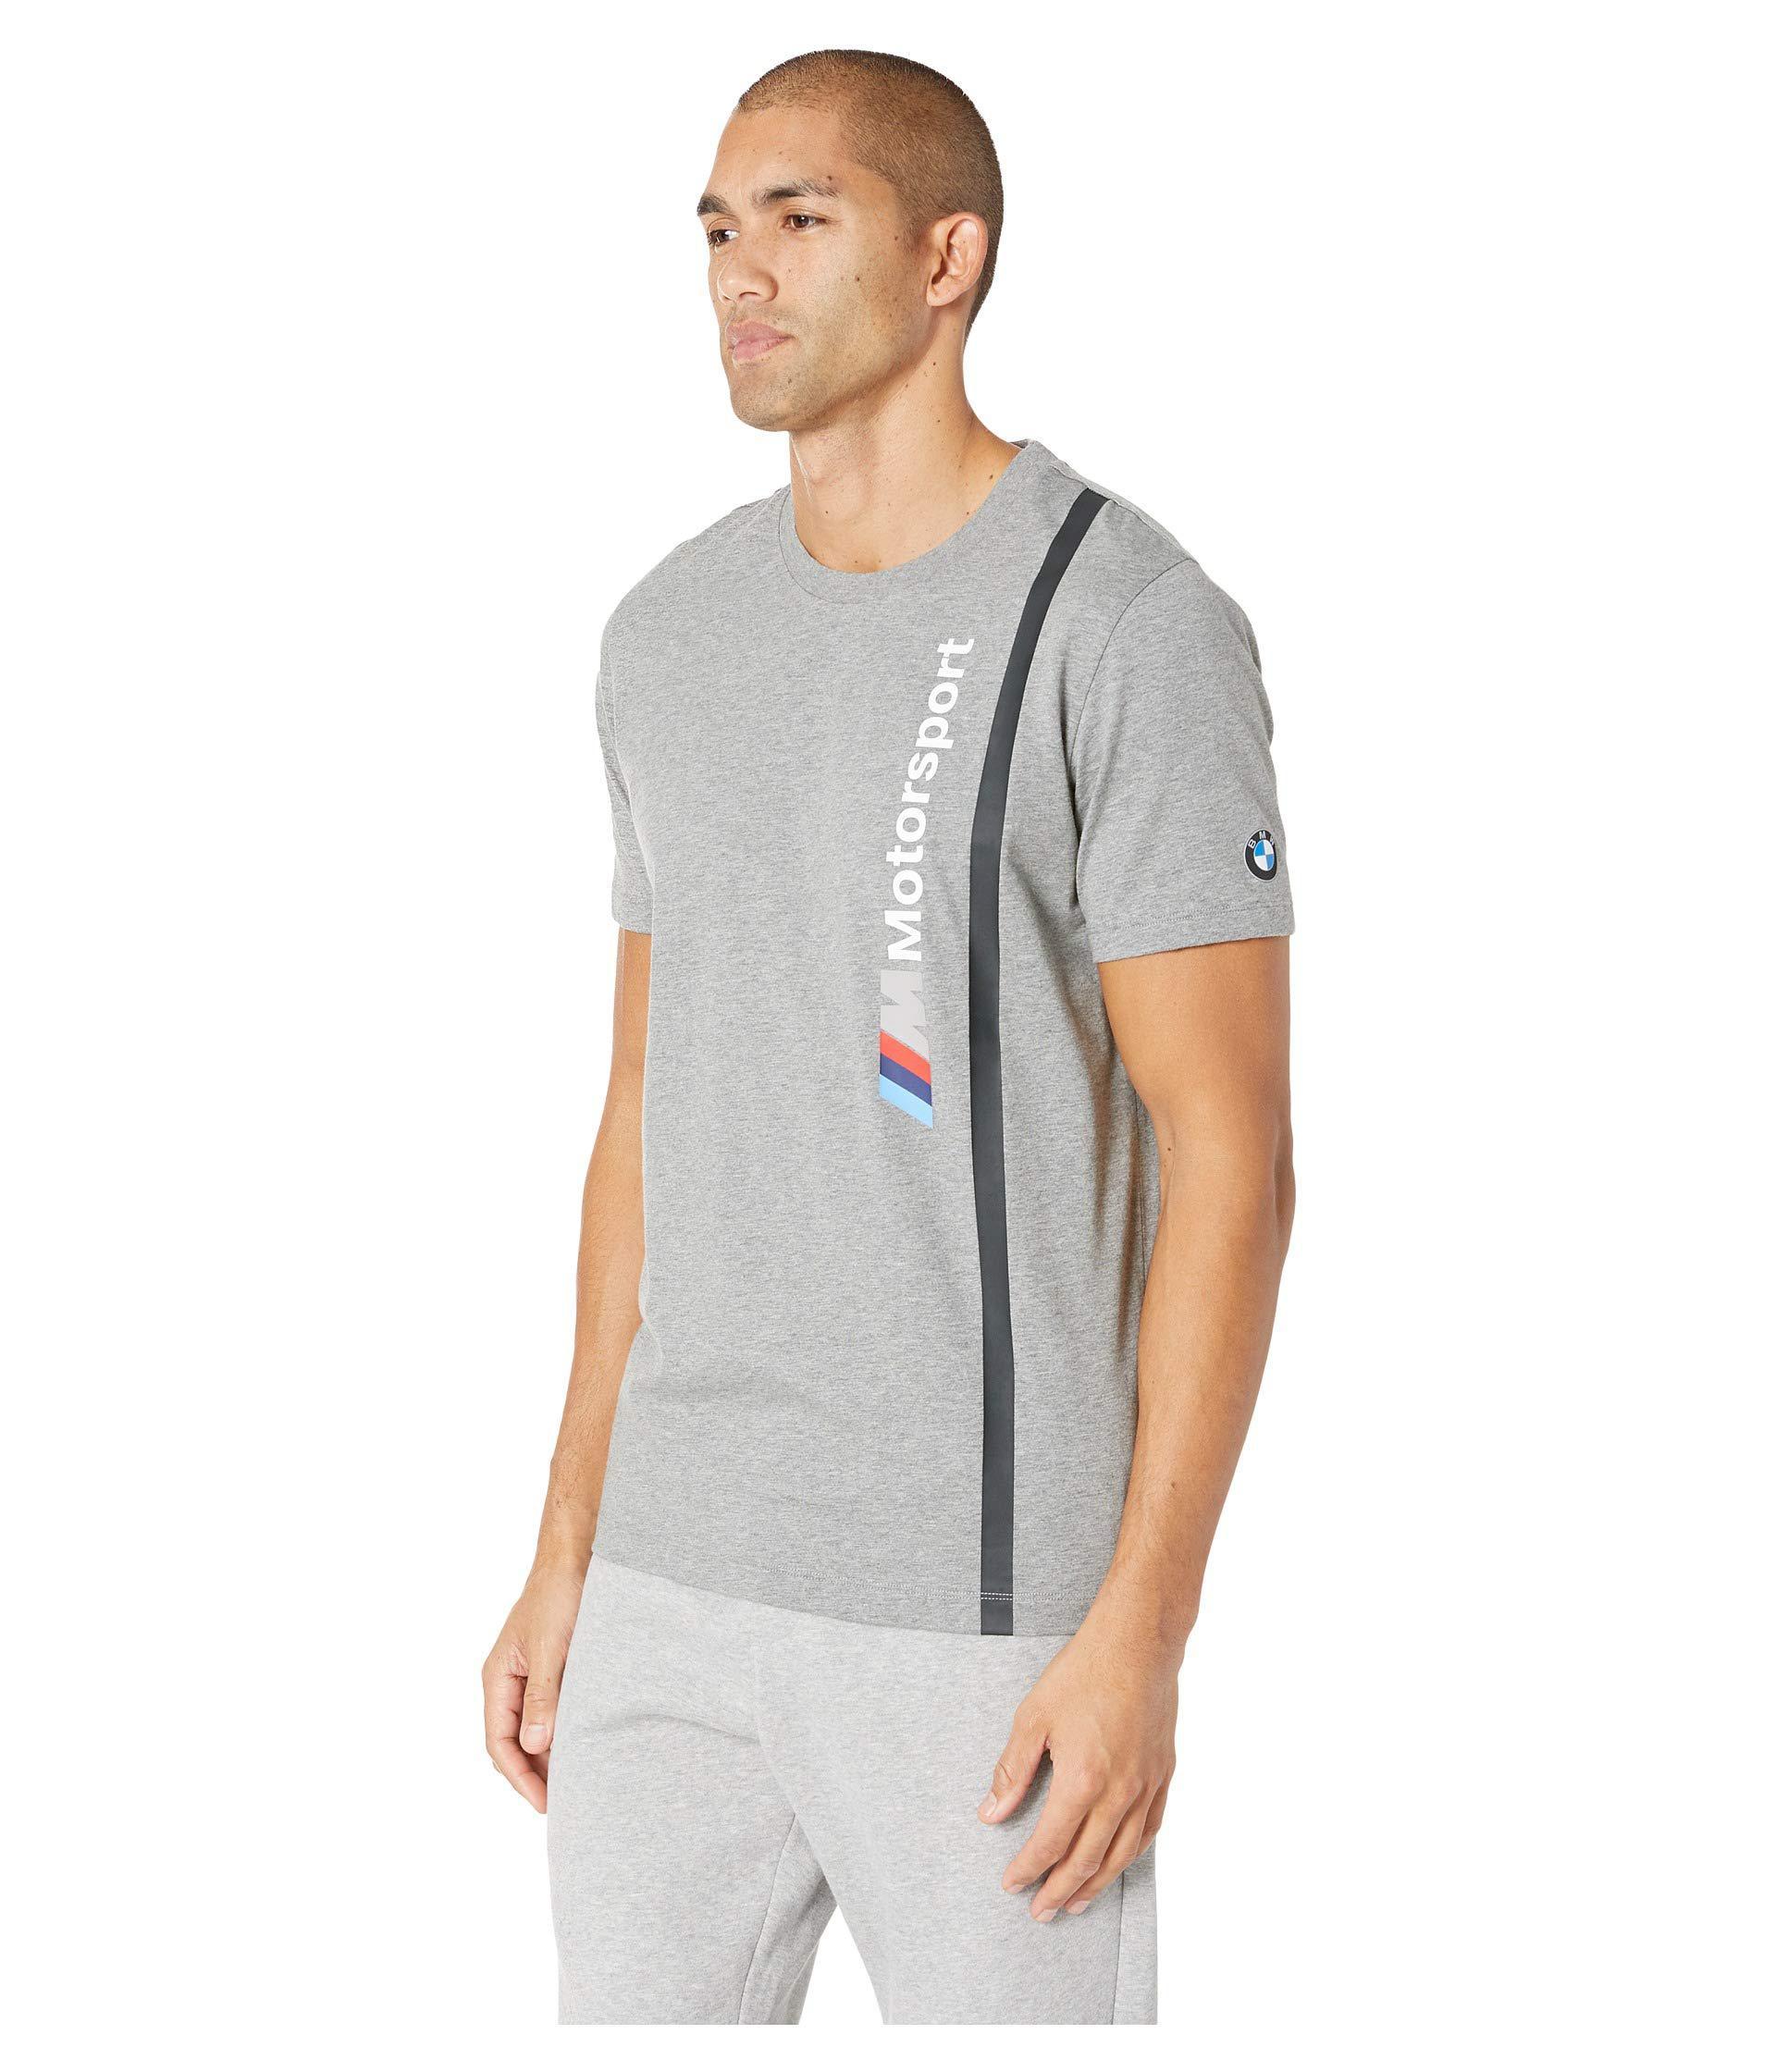 bf2a25a7 Lyst - PUMA Bmw Mms Logo Tee (medium Grey Heather) Men's T Shirt in Gray  for Men